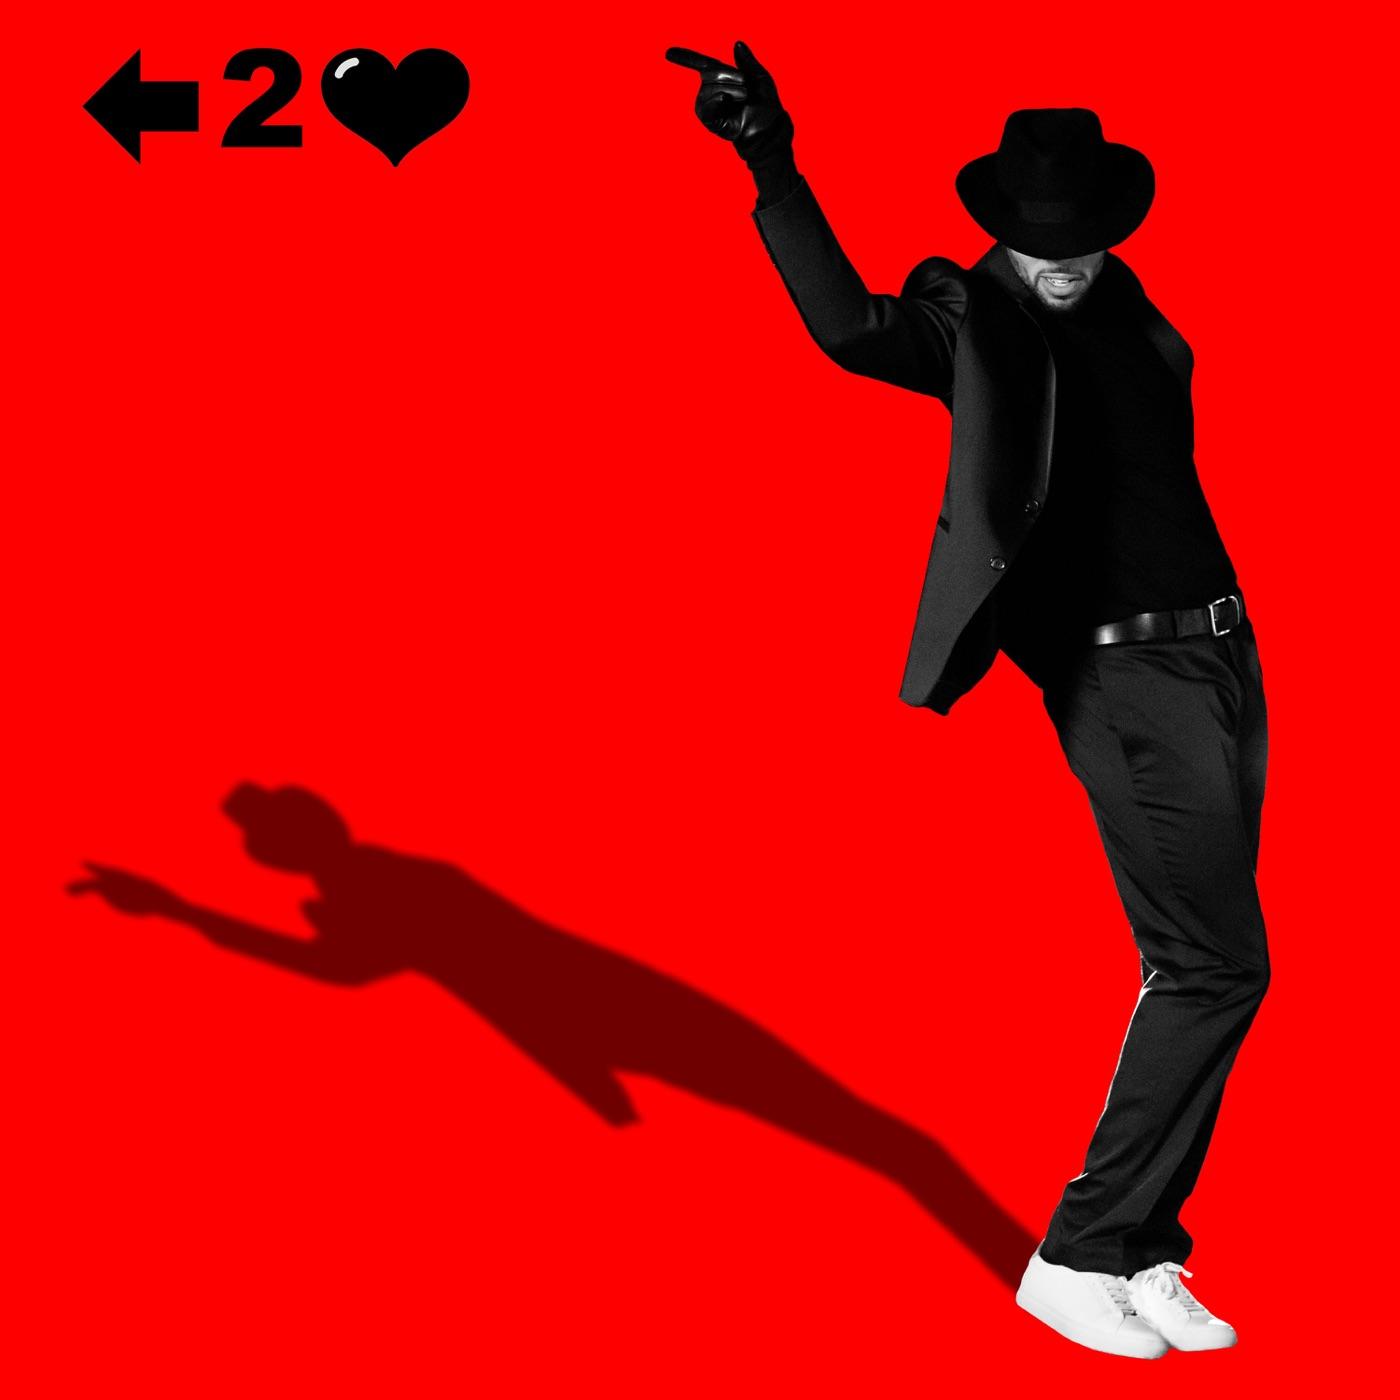 Chris Brown - Back to Love (Clean / Explicit) - Single [iTunes Plus